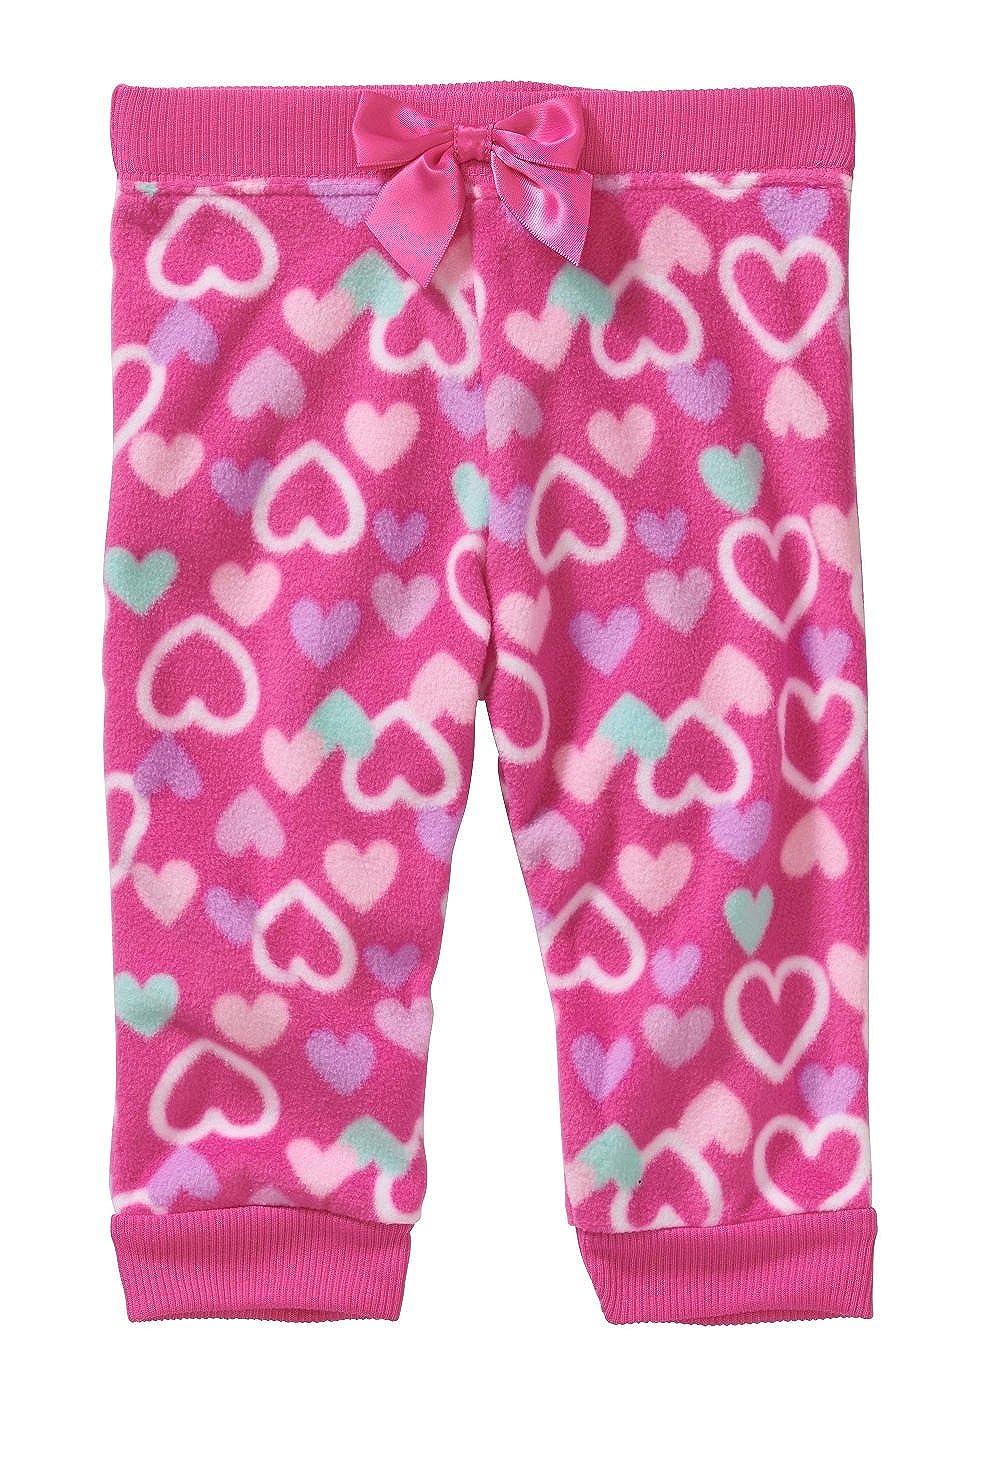 5ff9a4dbb7c Amazon.com  Garanimals Baby Girls  Micro Fleece Pants Bottoms  Clothing